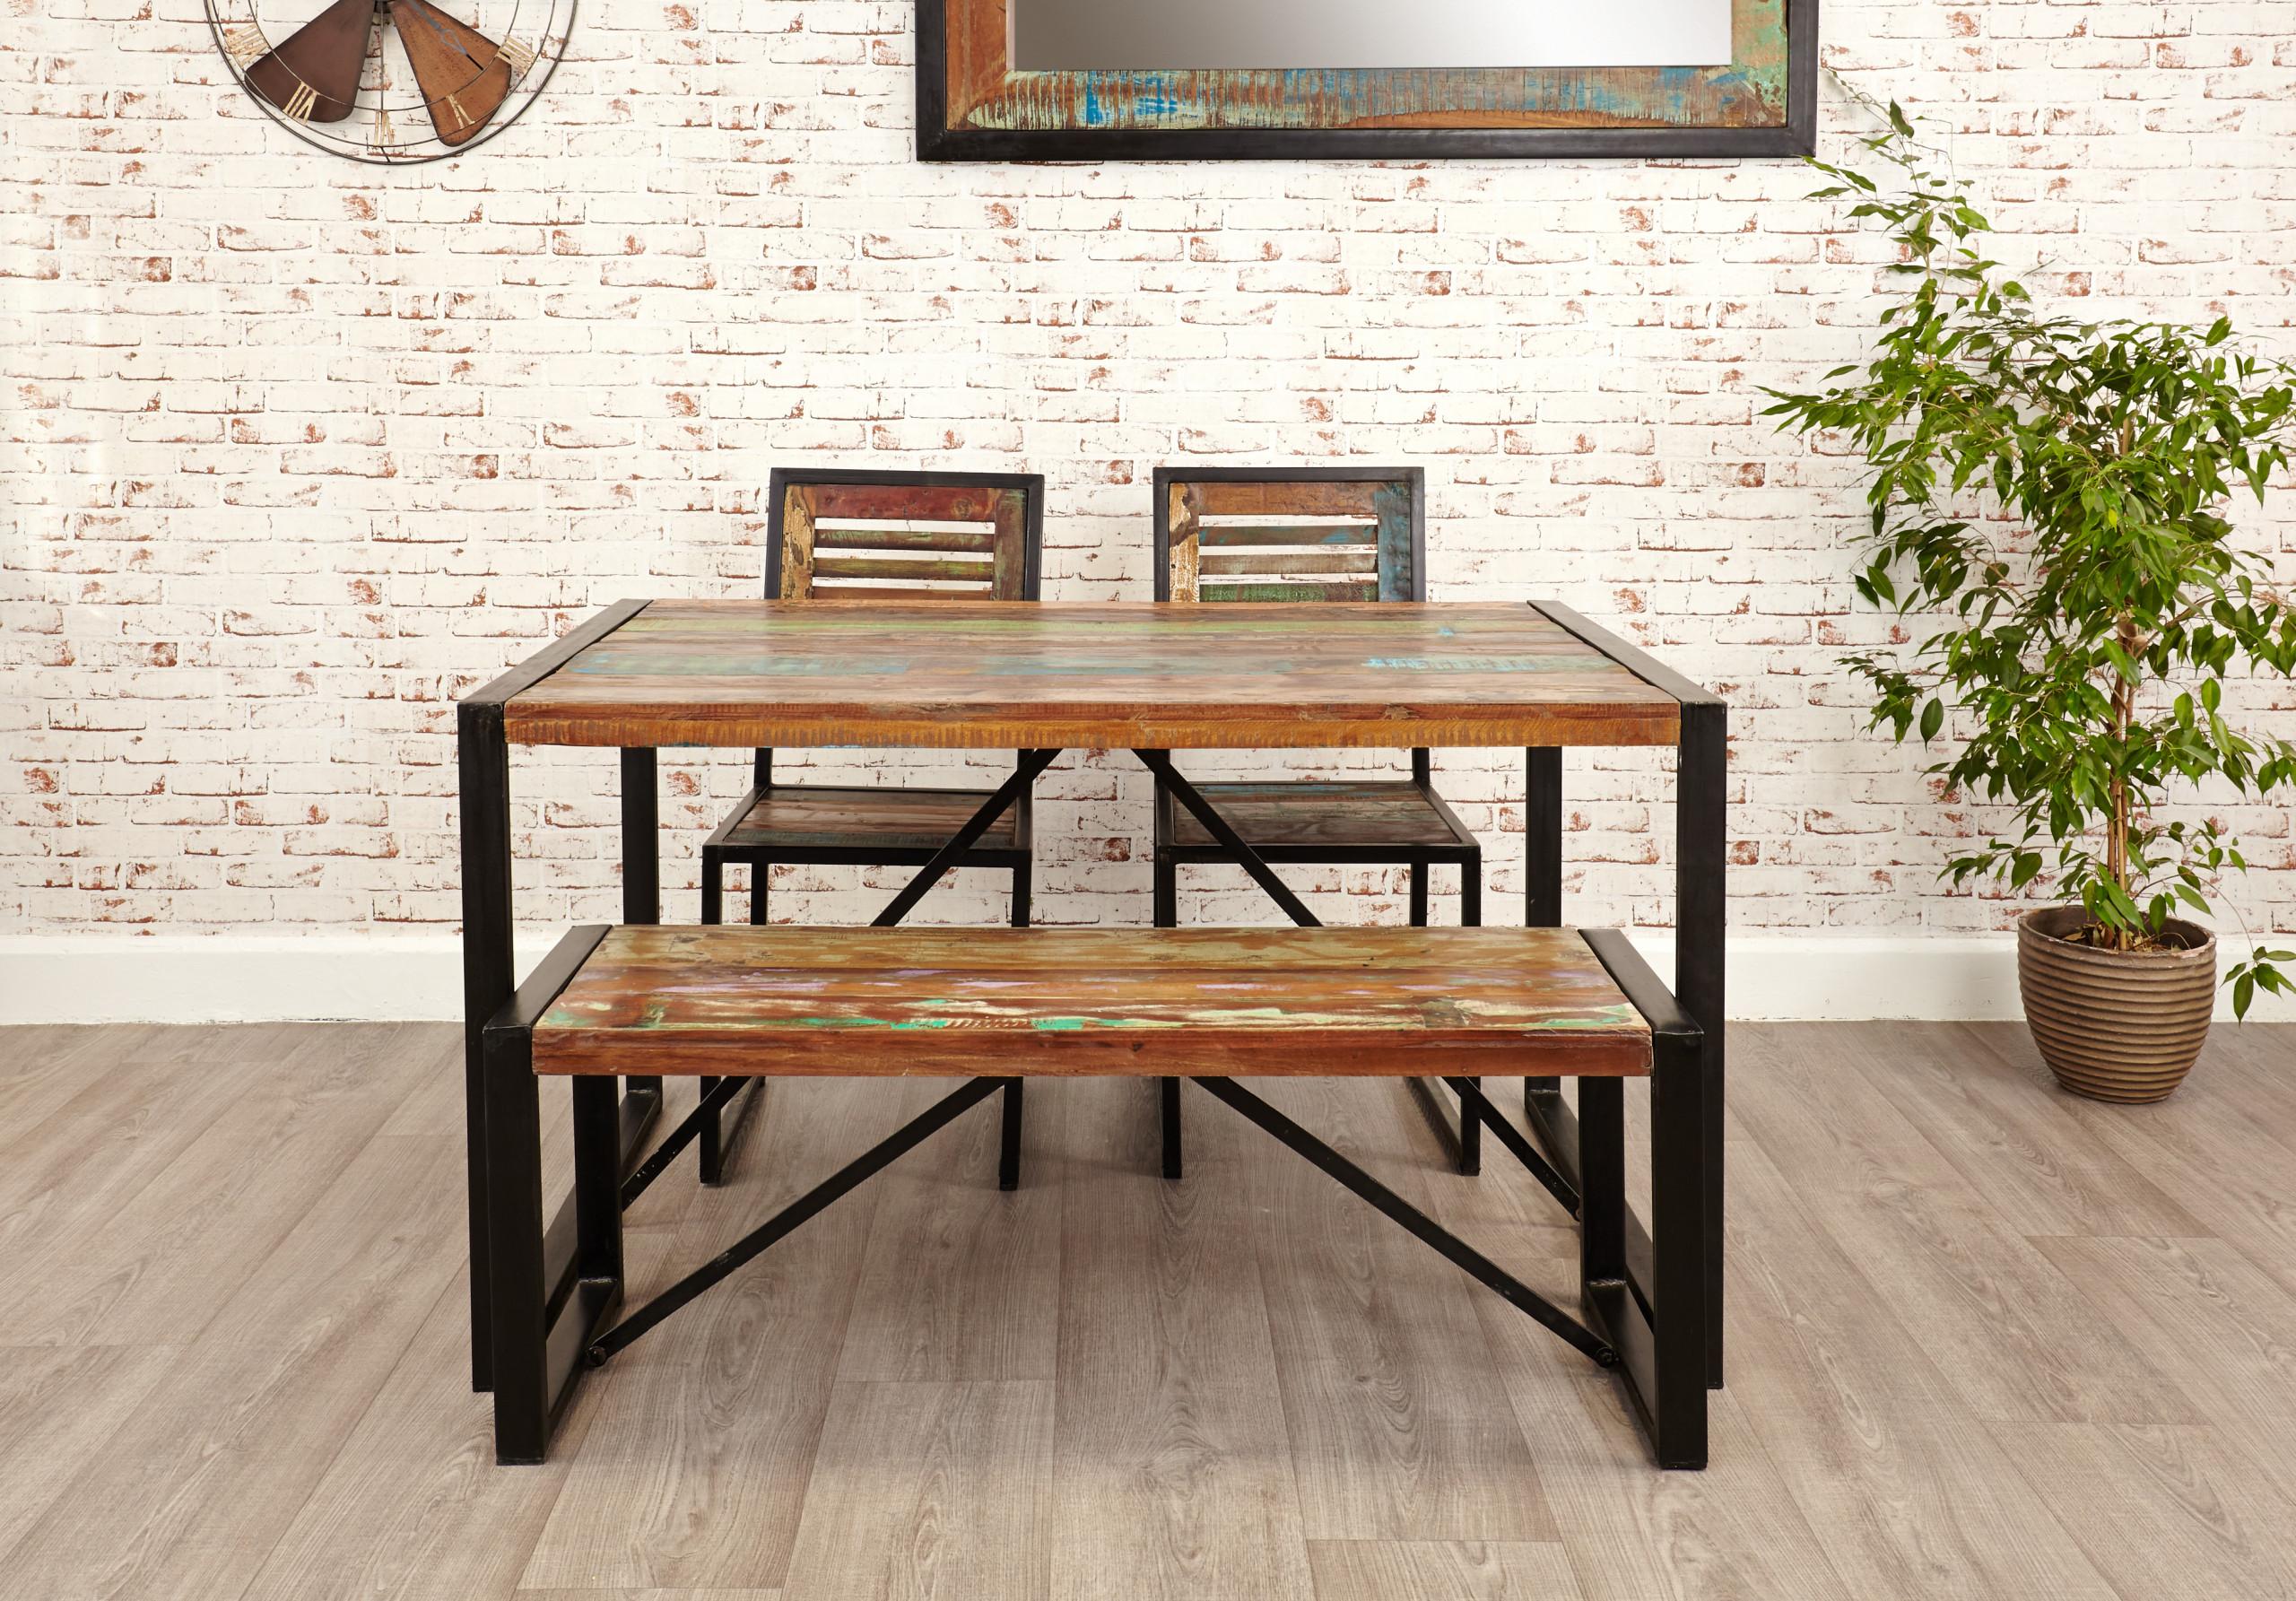 Urban Chic: Dining Bench (seats 2)